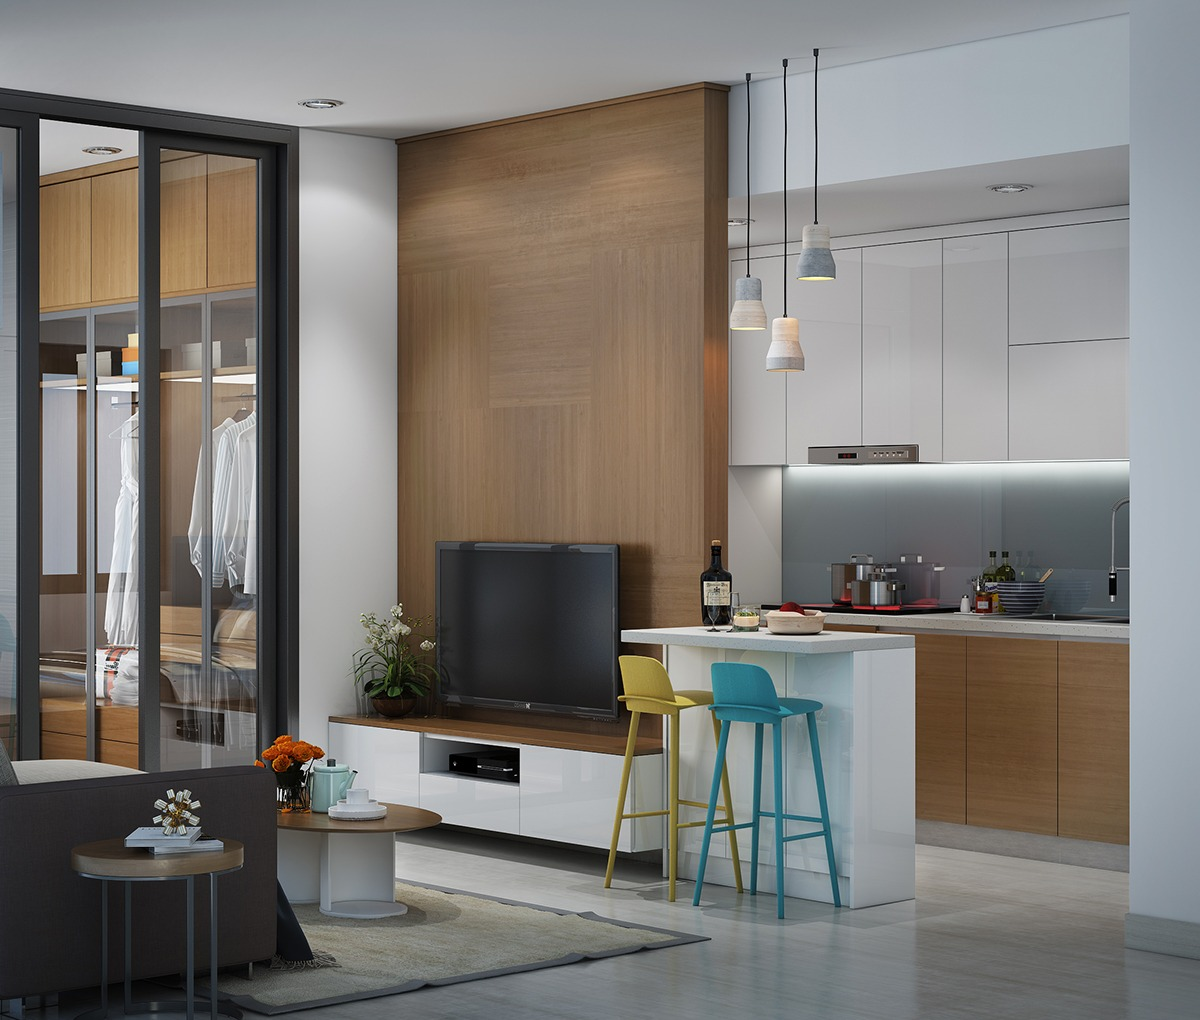 5 Stylish Amp Organized Mini Apartments